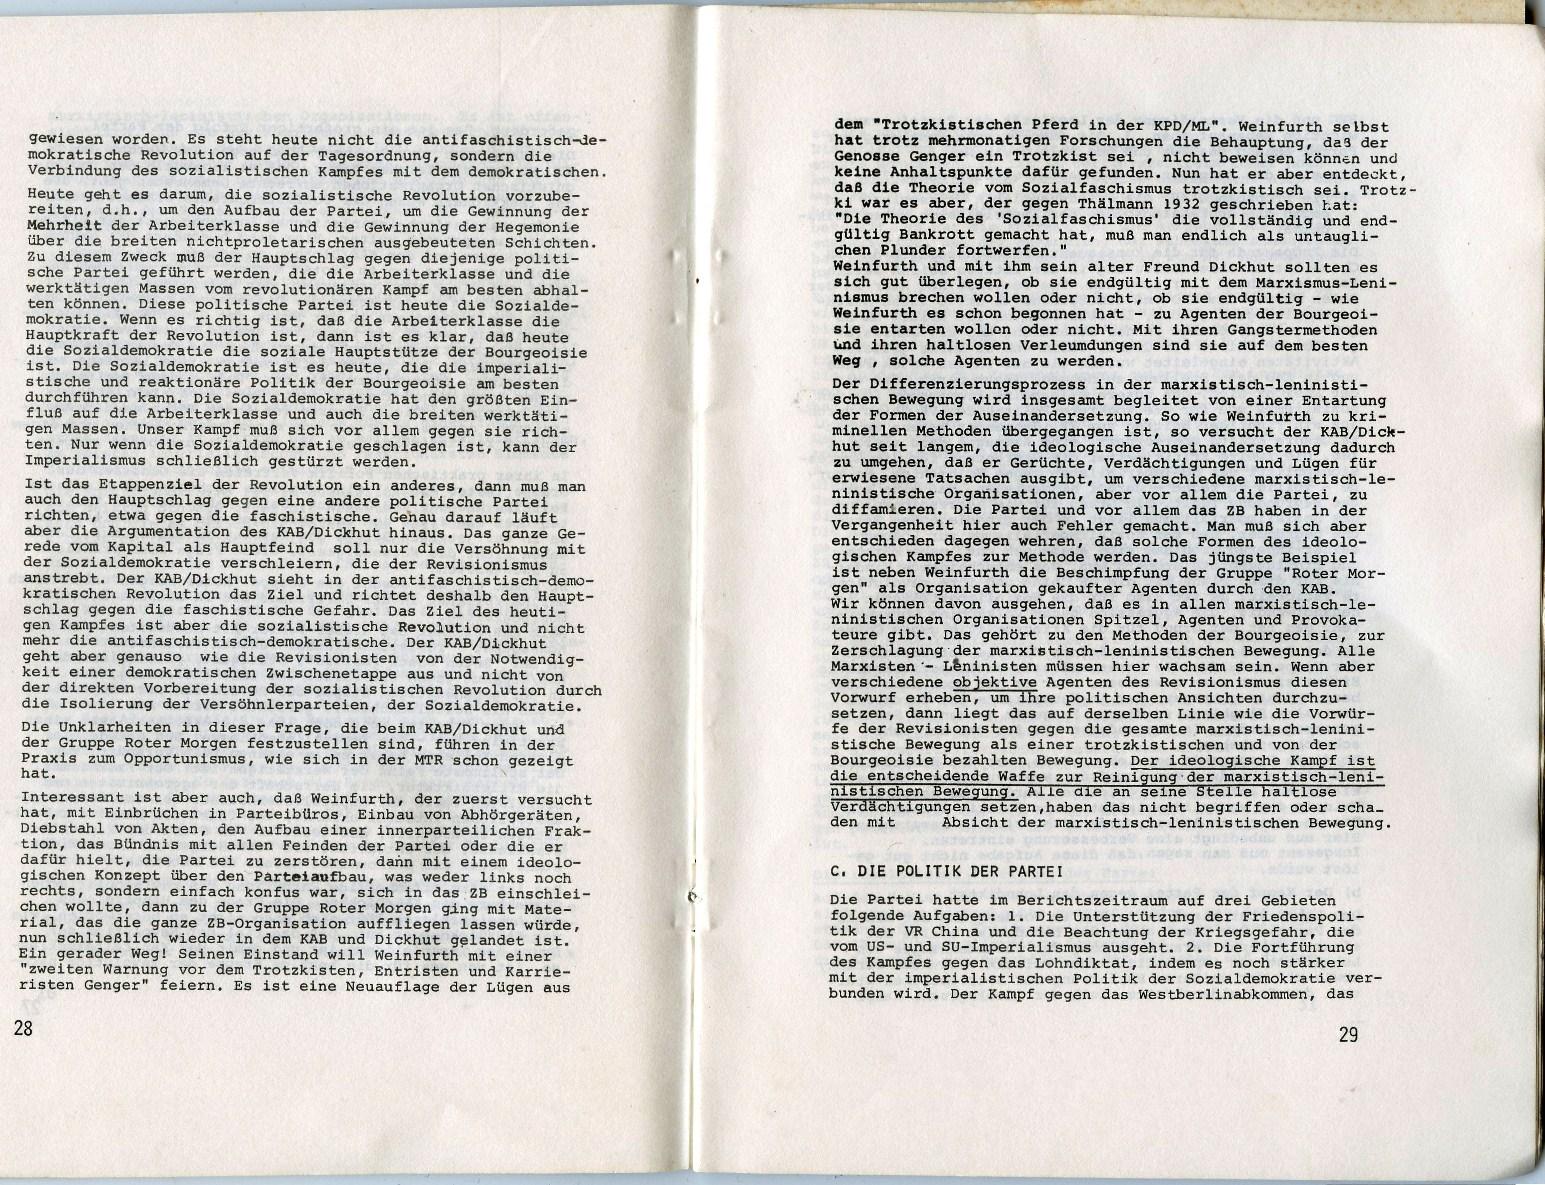 ZB_Parteiarbeiter_1971_09_15